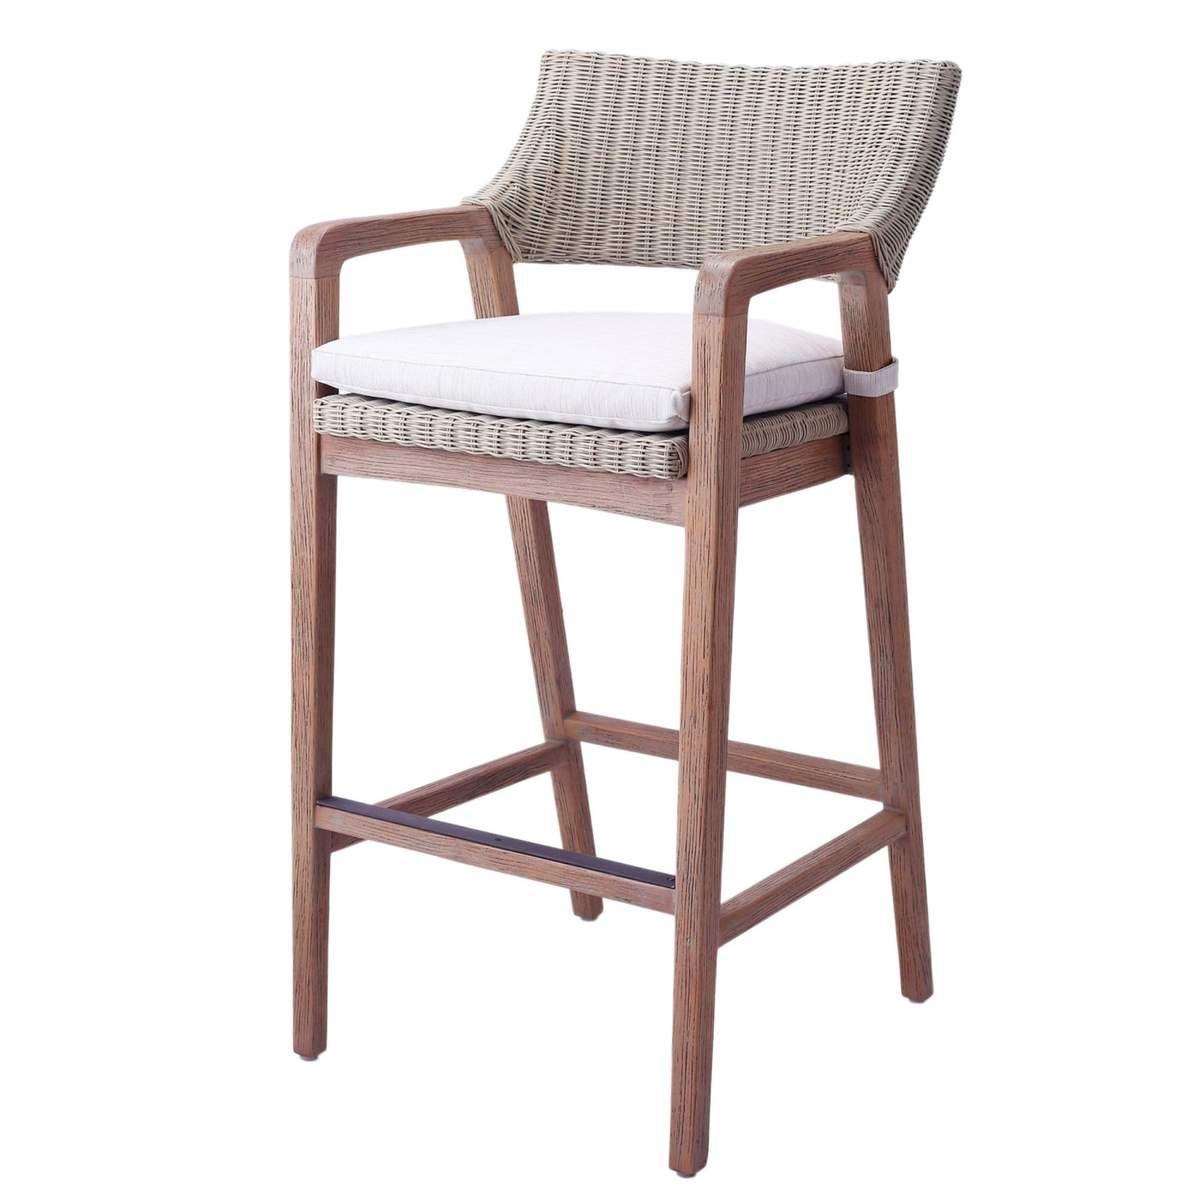 Richlands Furniture Lawton 26 Swivel Counter Stool In Antique Gray Nfm In 2021 Swivel Counter Stools Swivel Bar Stools Swivel Stool